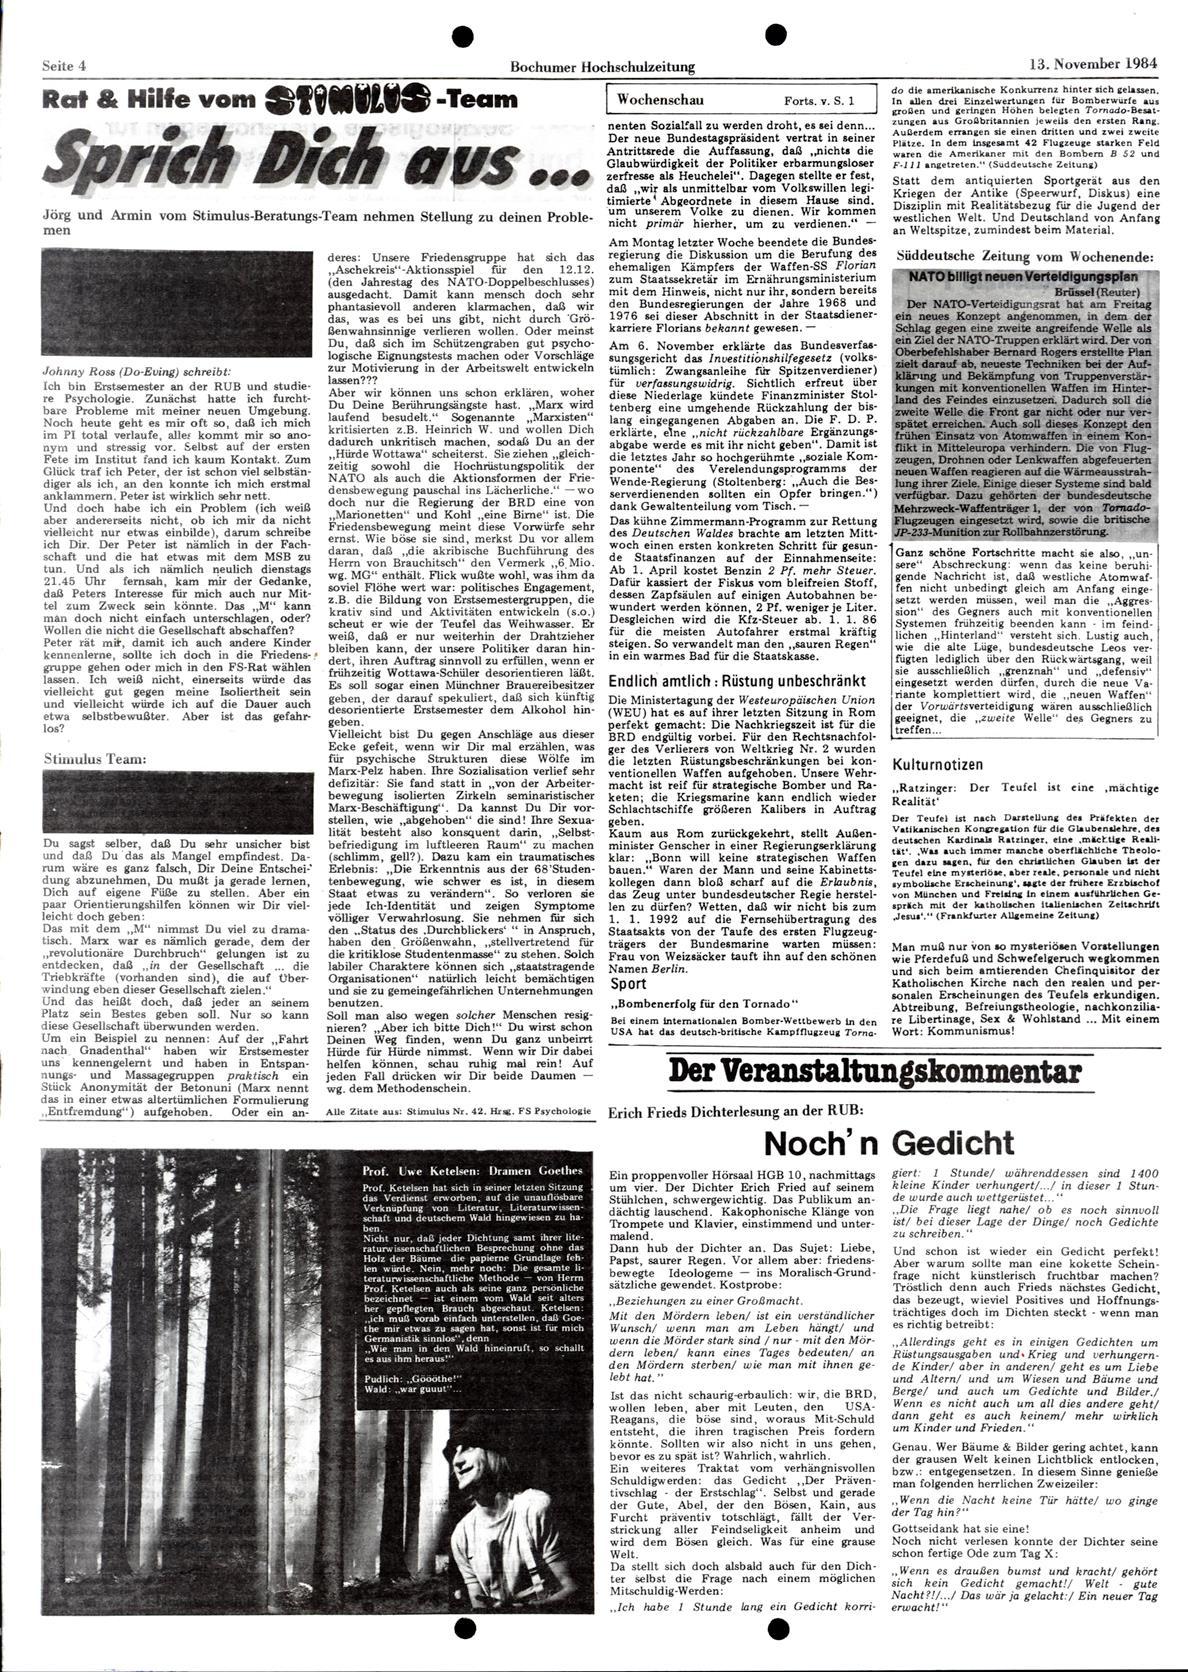 Bochum_BHZ_19841113_100_004